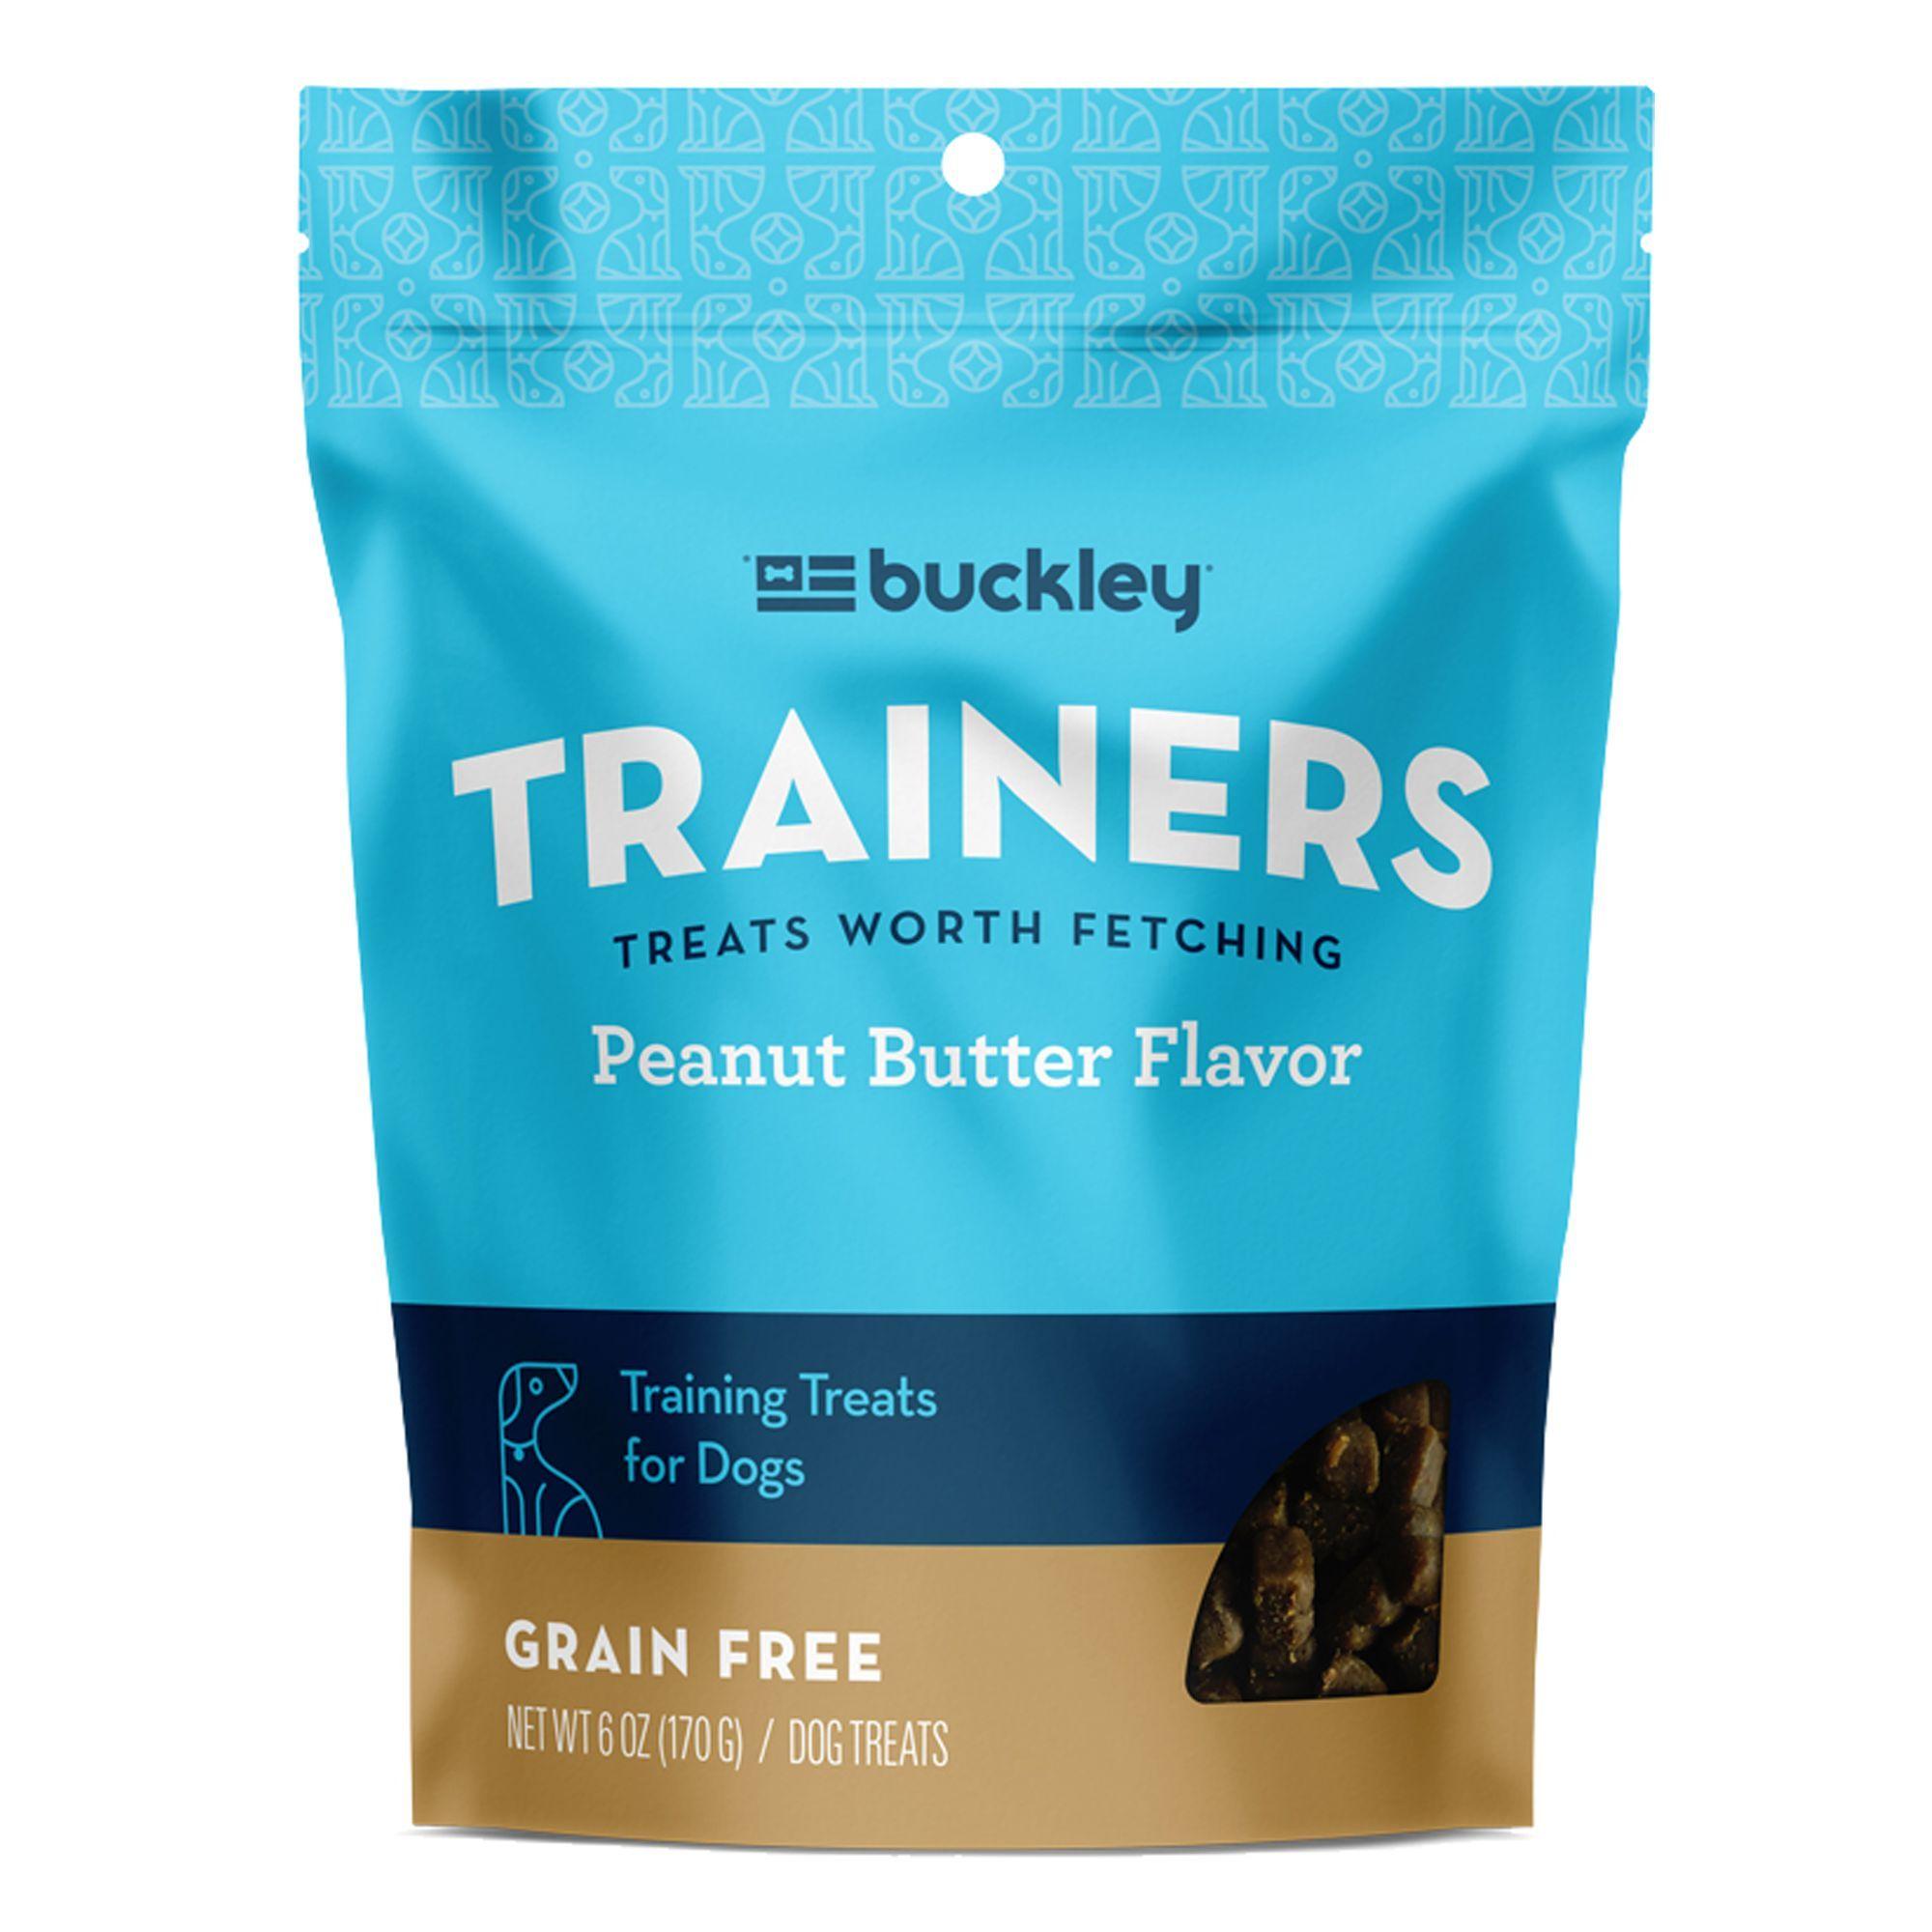 Buckley Trainers Dog Treat Grain Free Peanut Butter Dog Treats